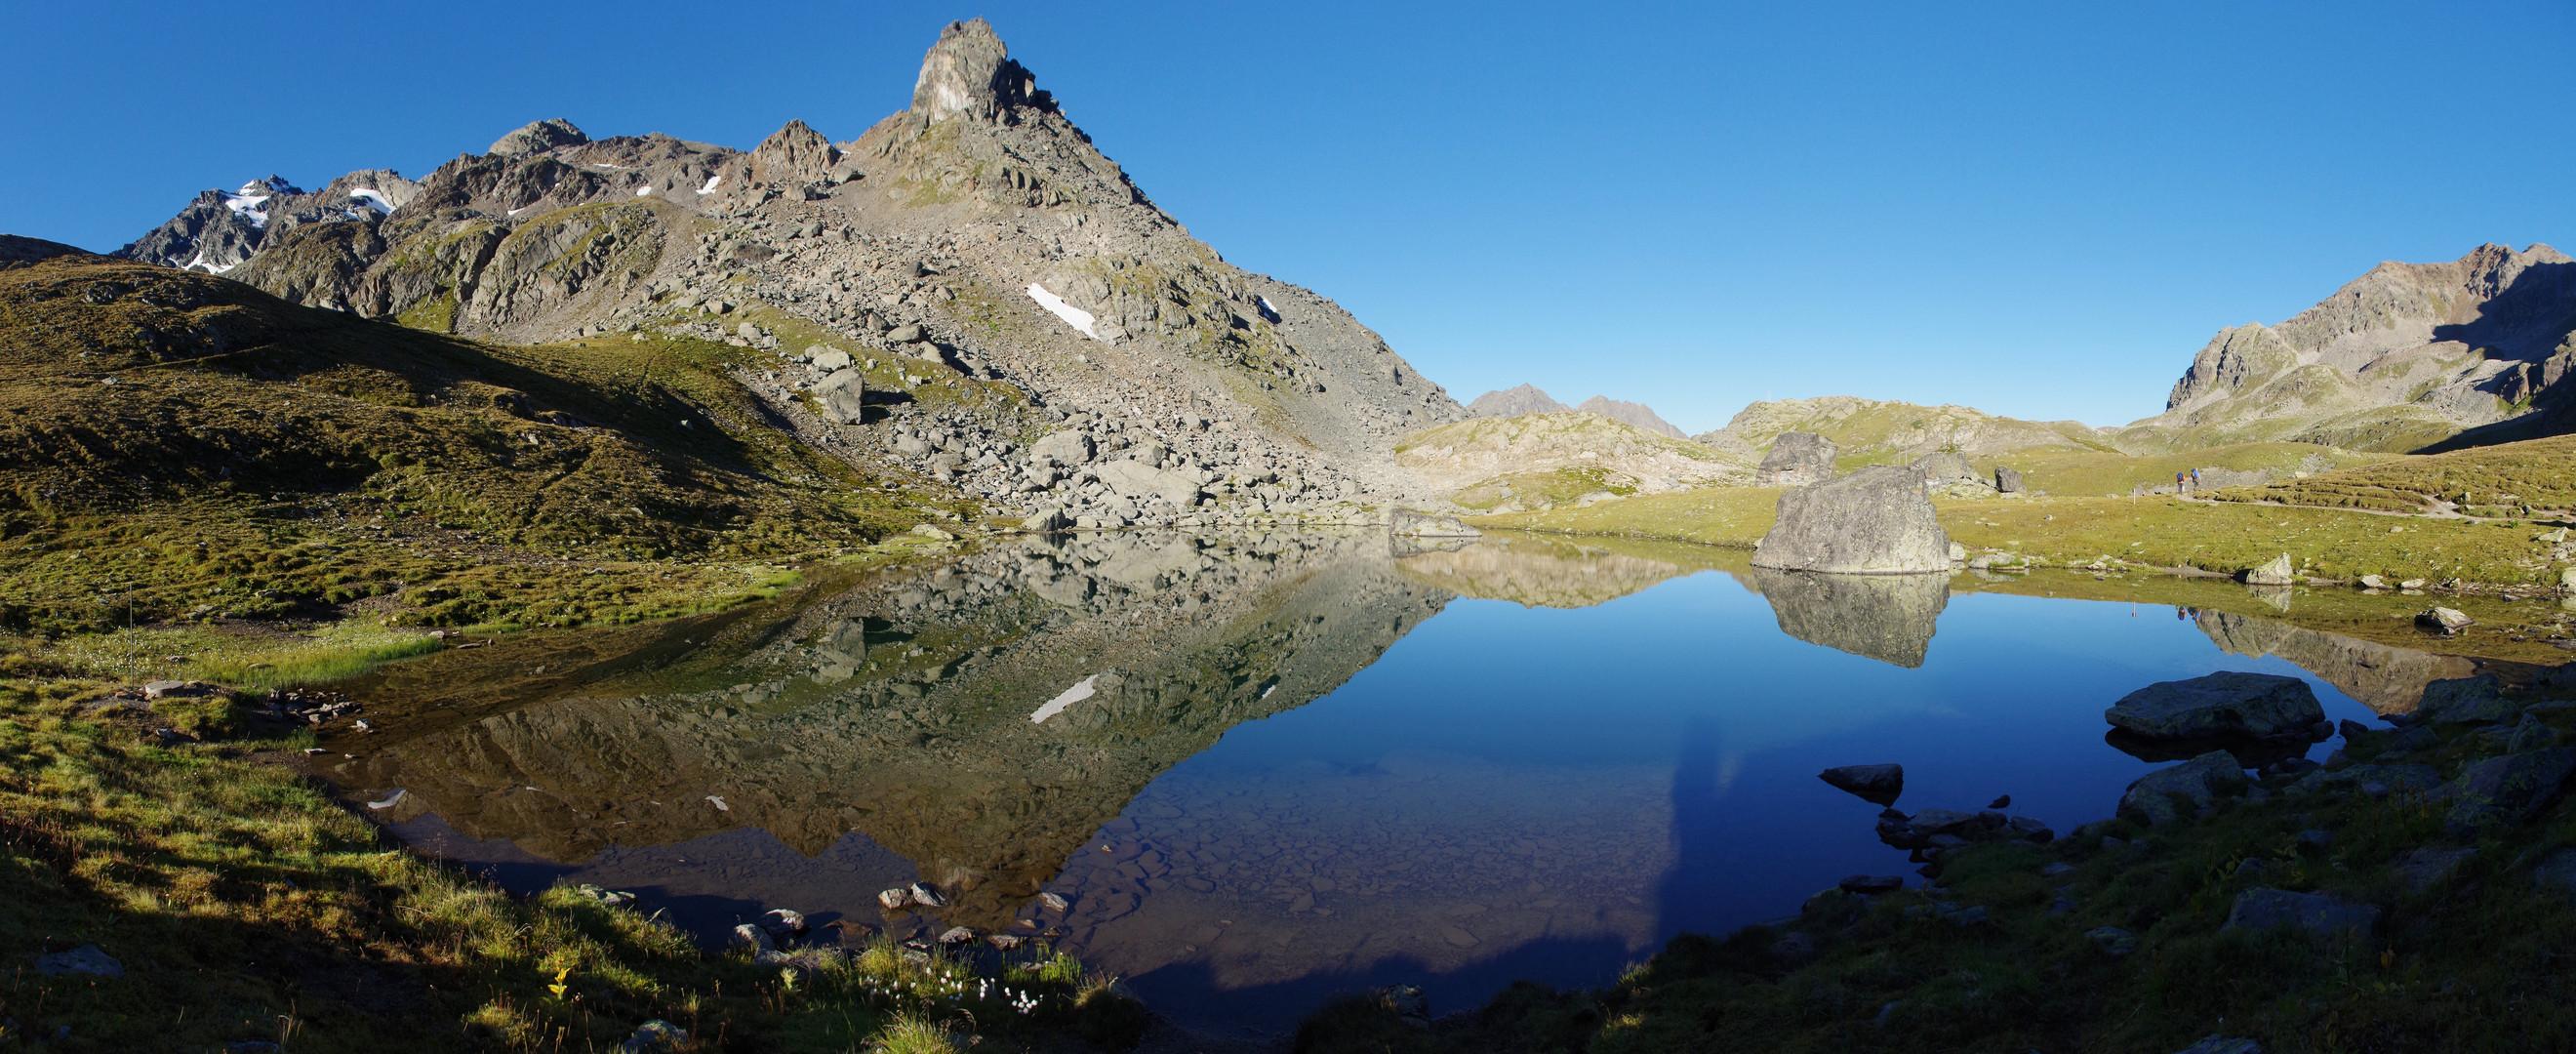 Bergsee neben der Grialetsch-Hütte